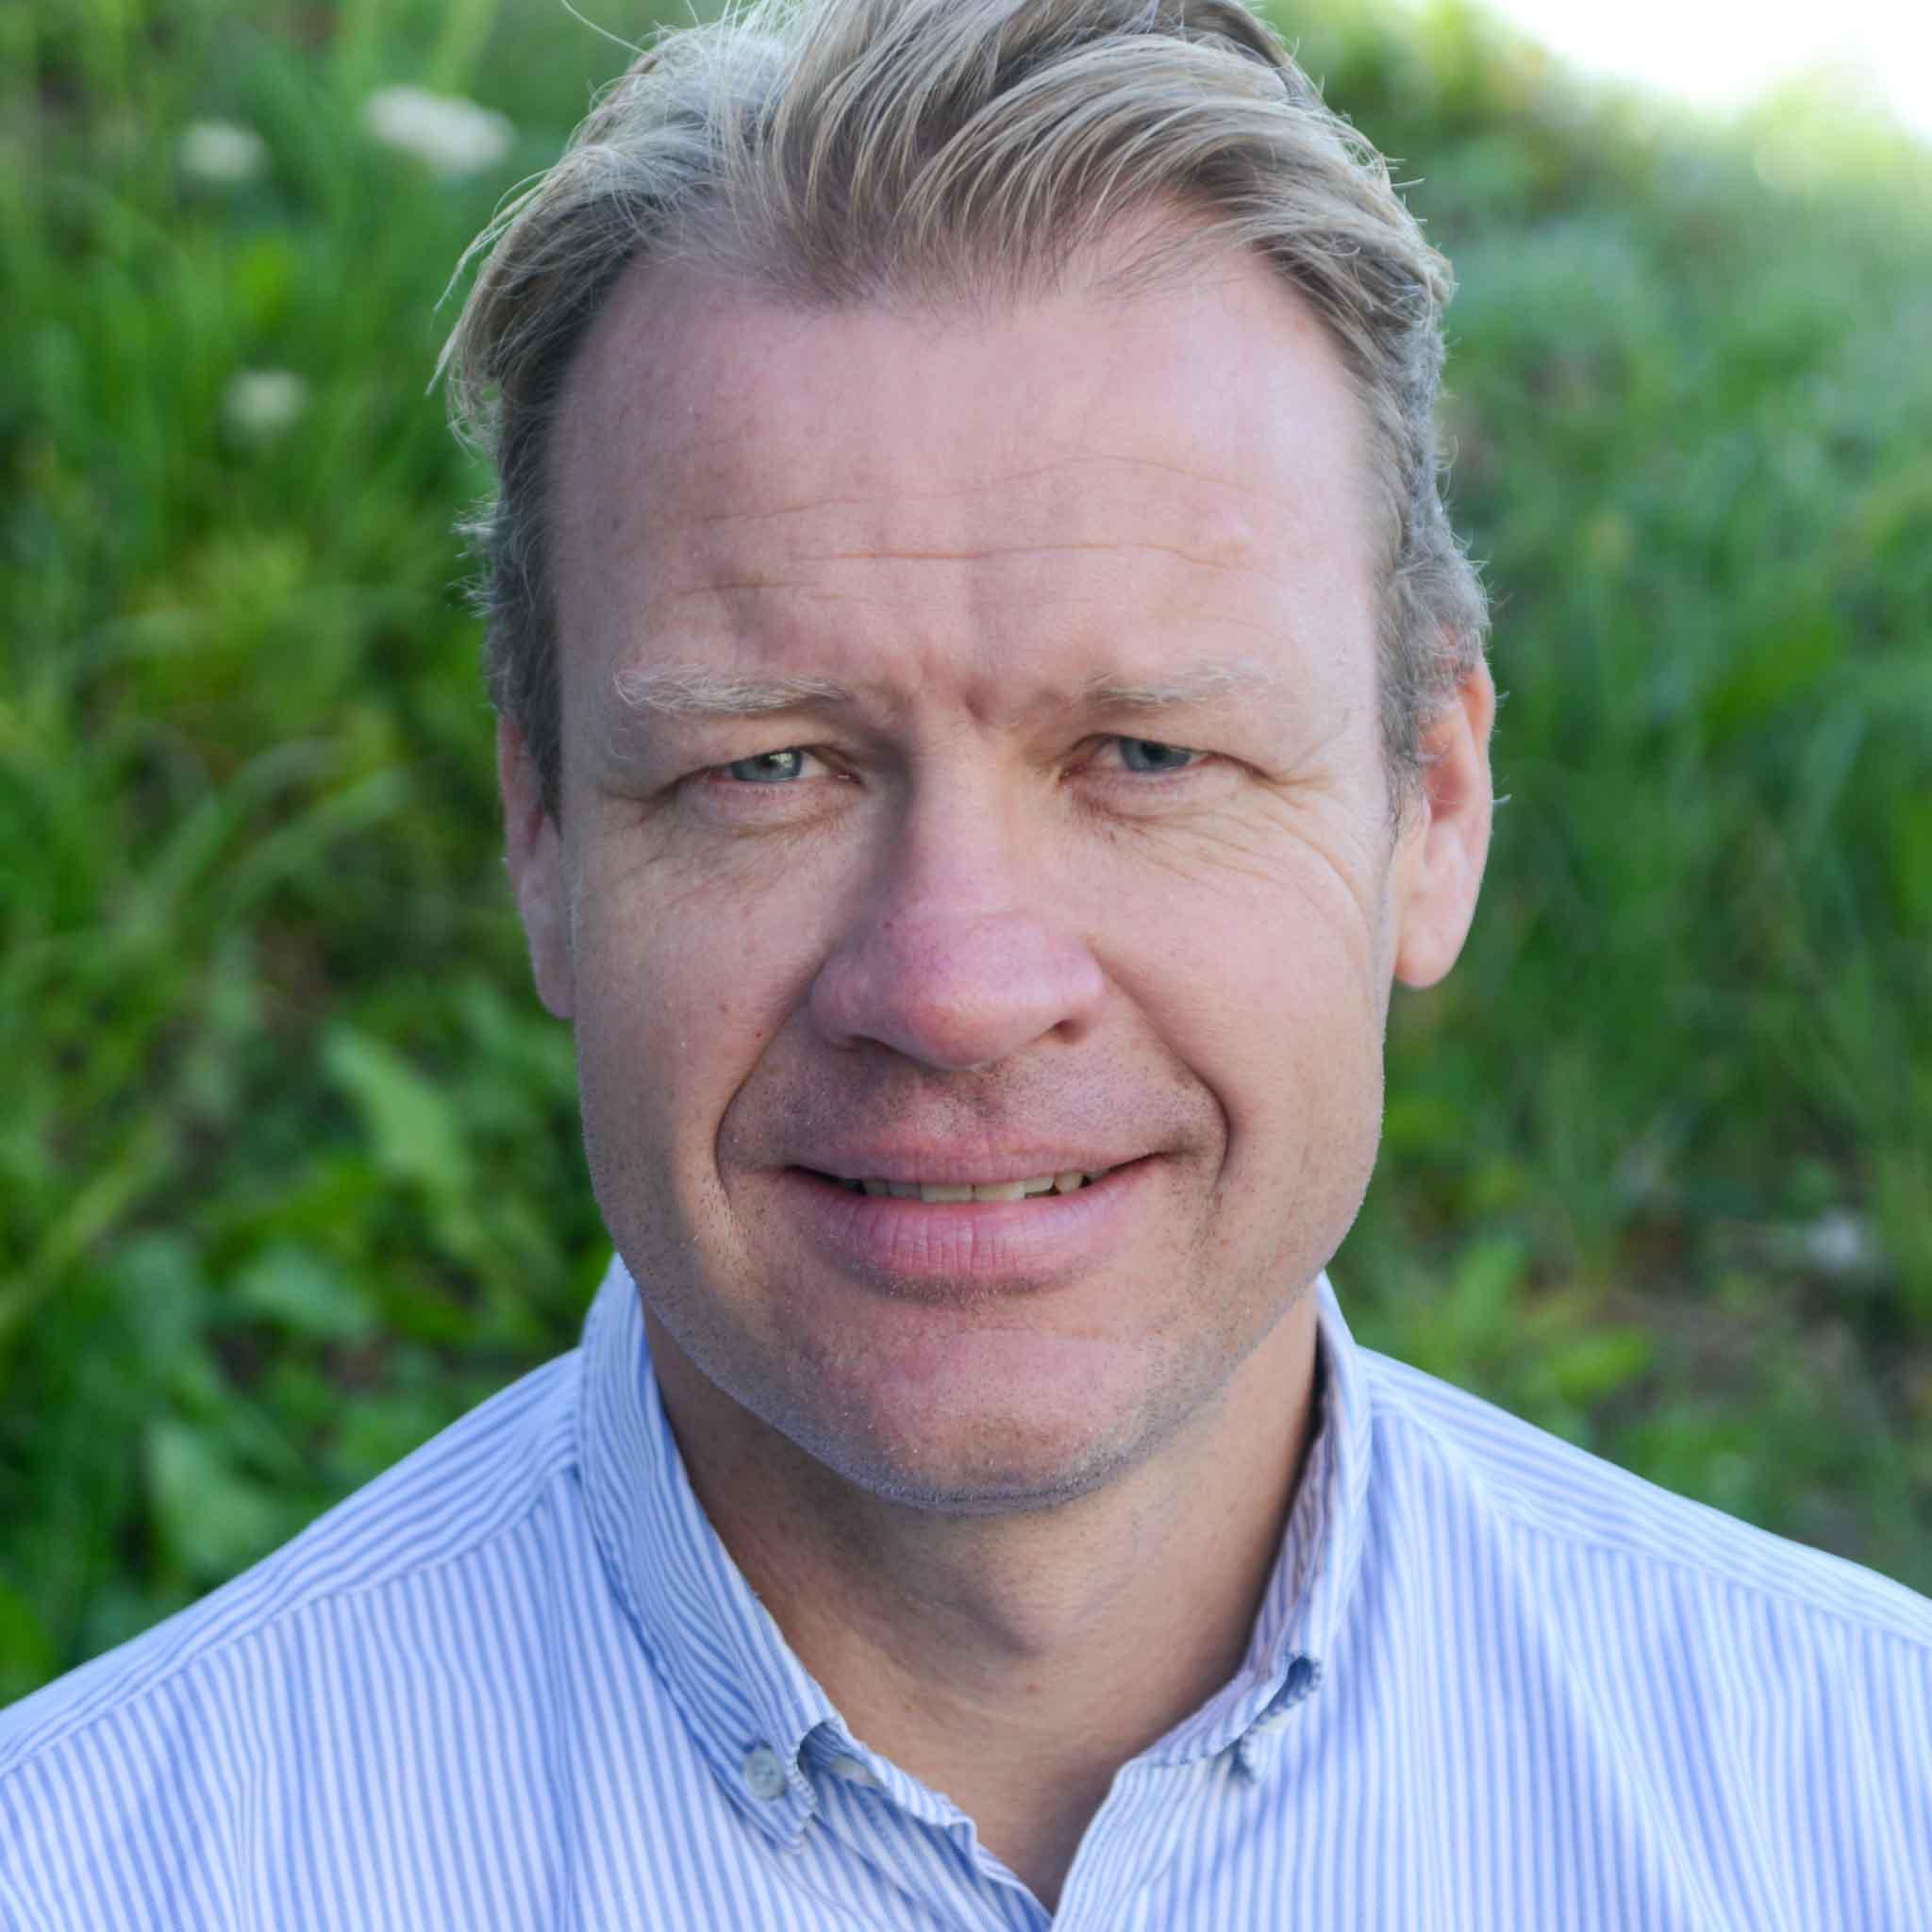 Anders Rytter Madsen